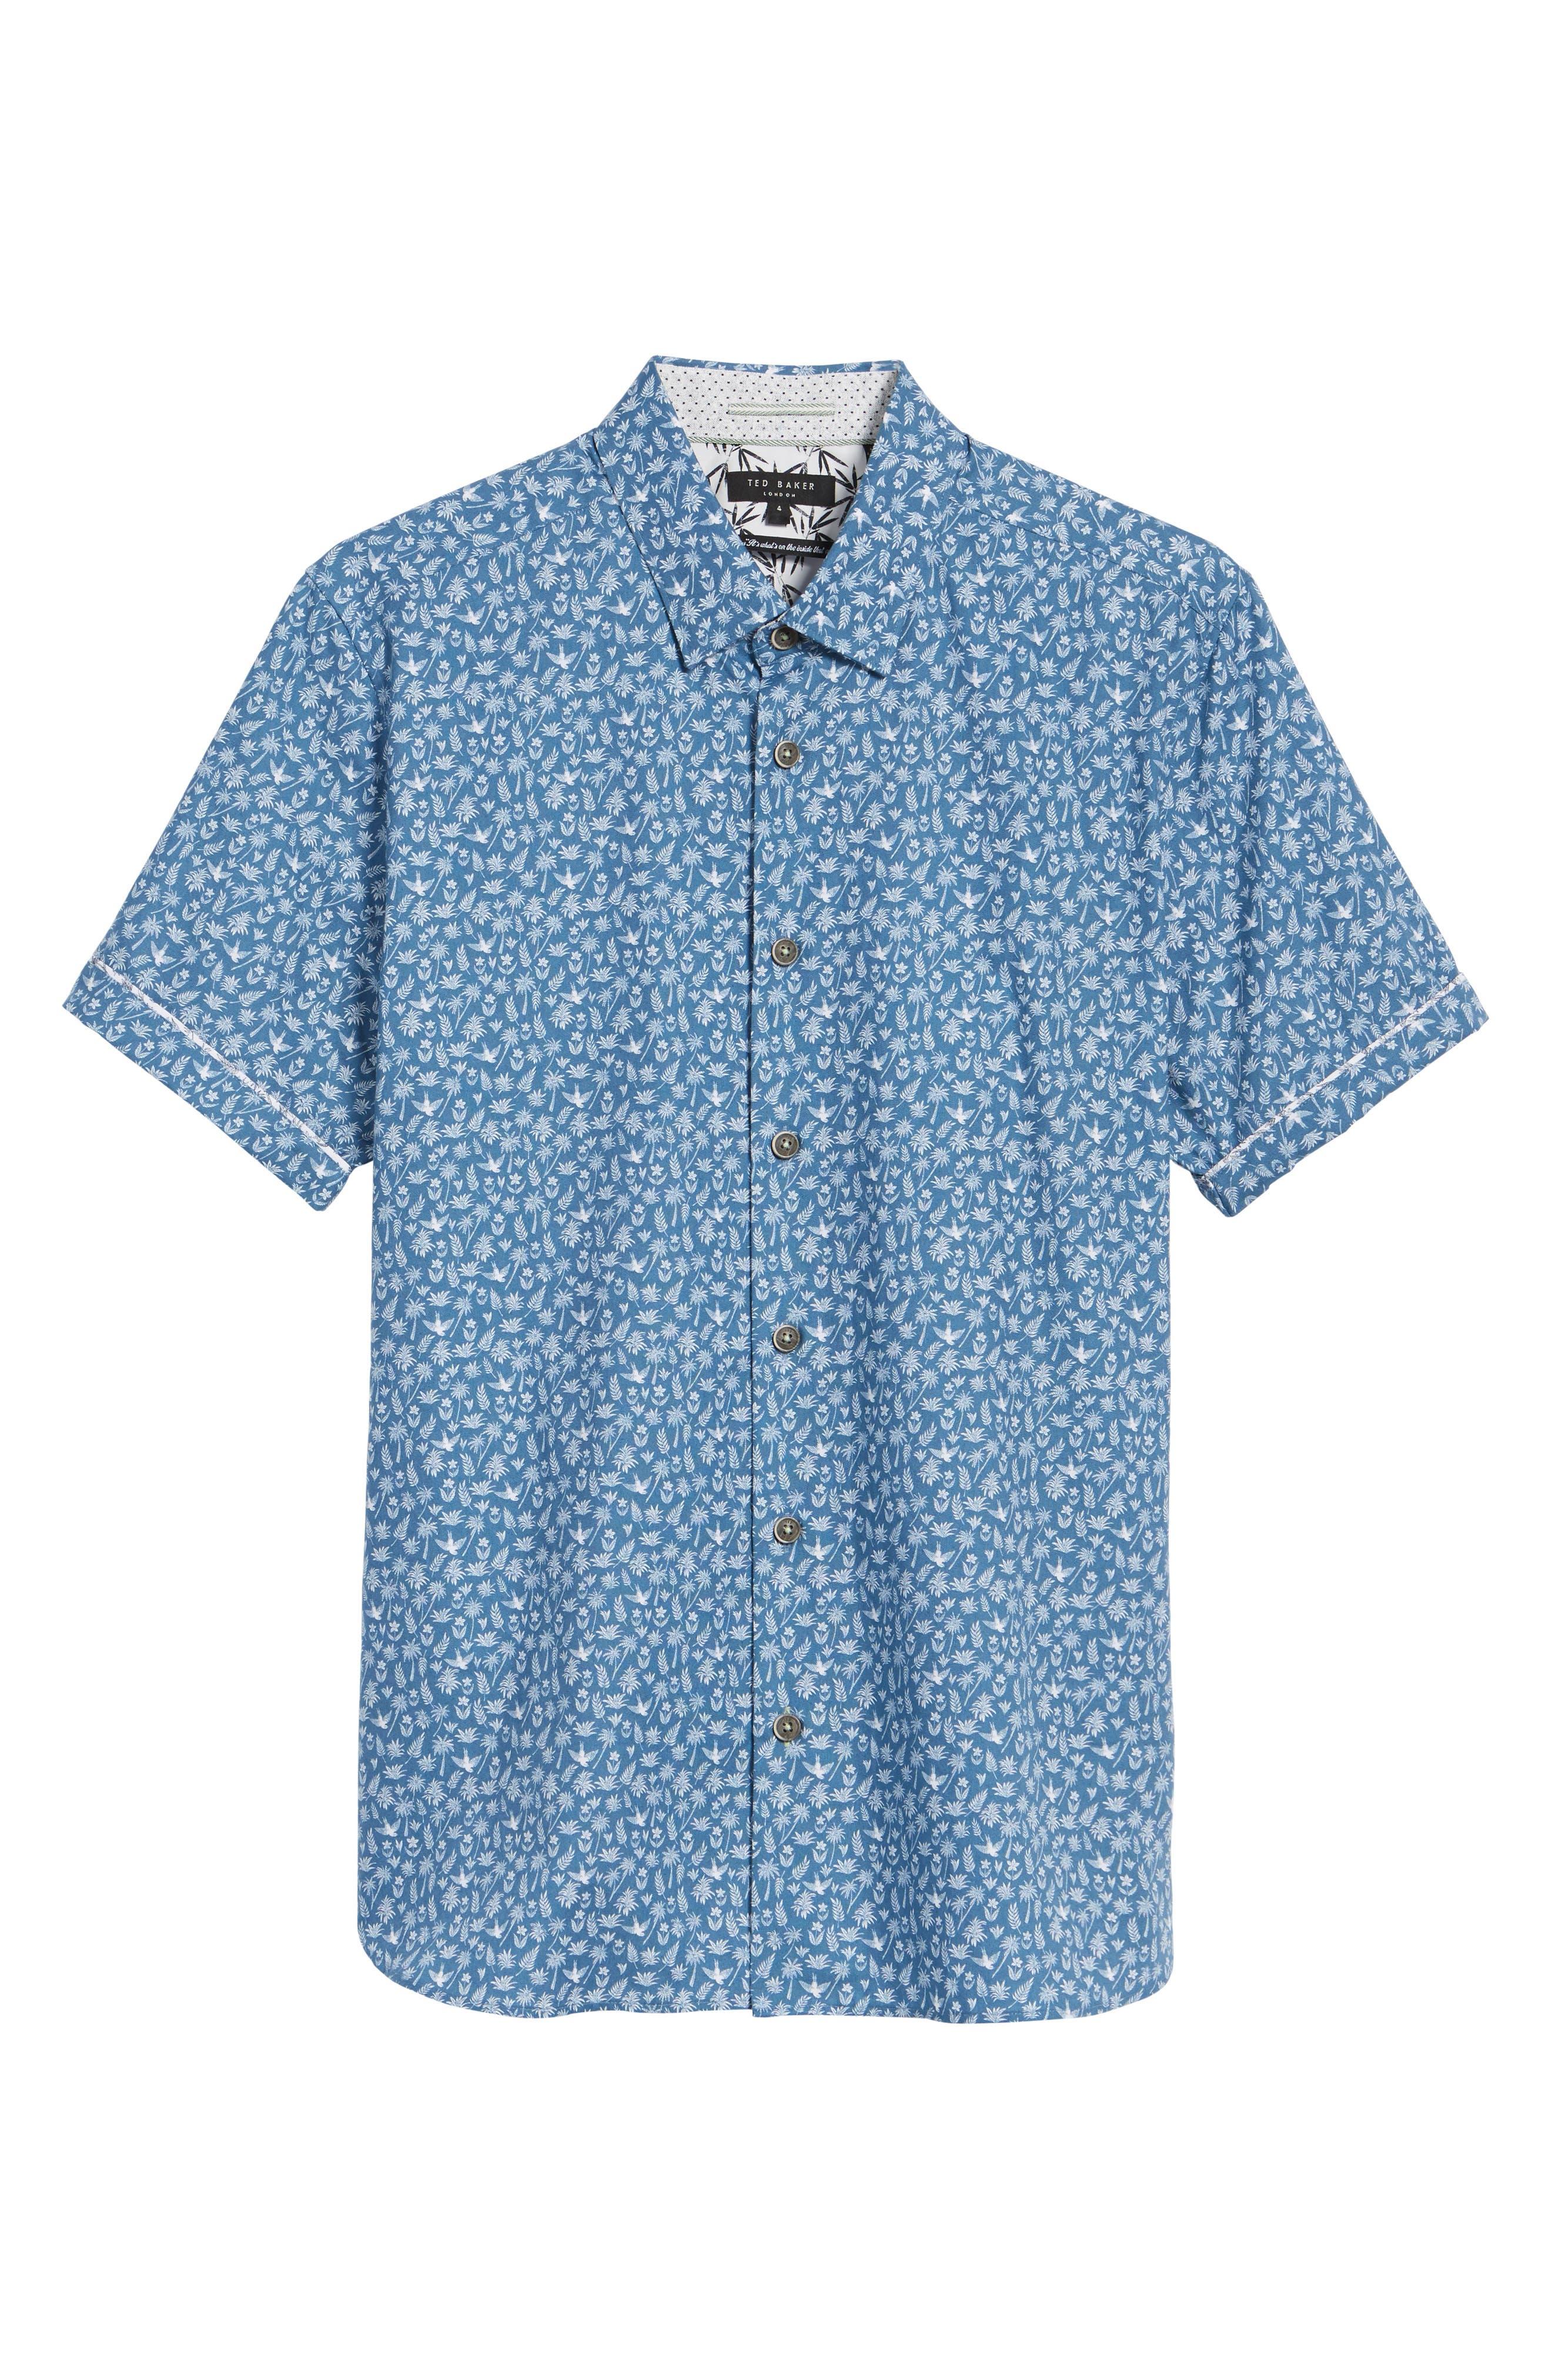 Pazta Tropic Print Shirt,                             Alternate thumbnail 6, color,                             400